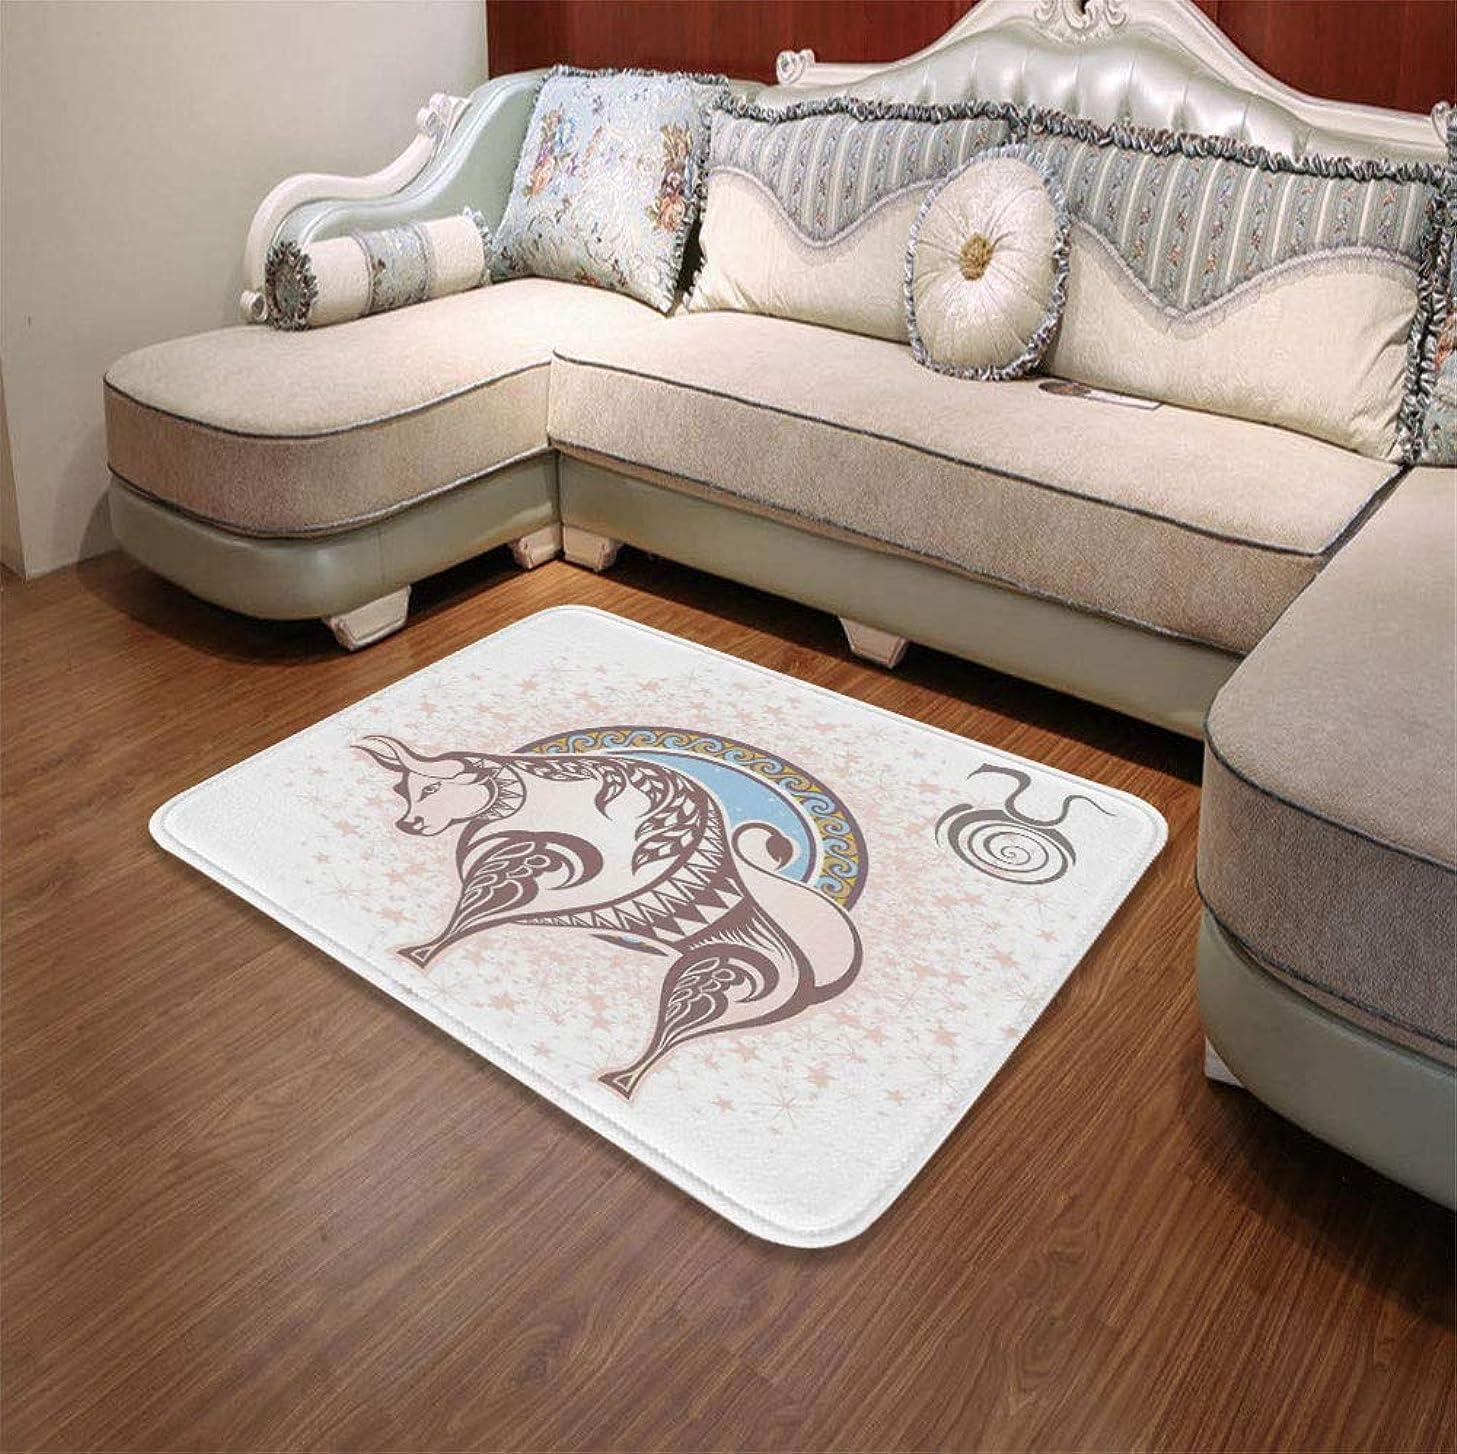 YOLIYANA Short Fur Floor Mat,Zodiac Decor,for Home Meeting Room,55.12